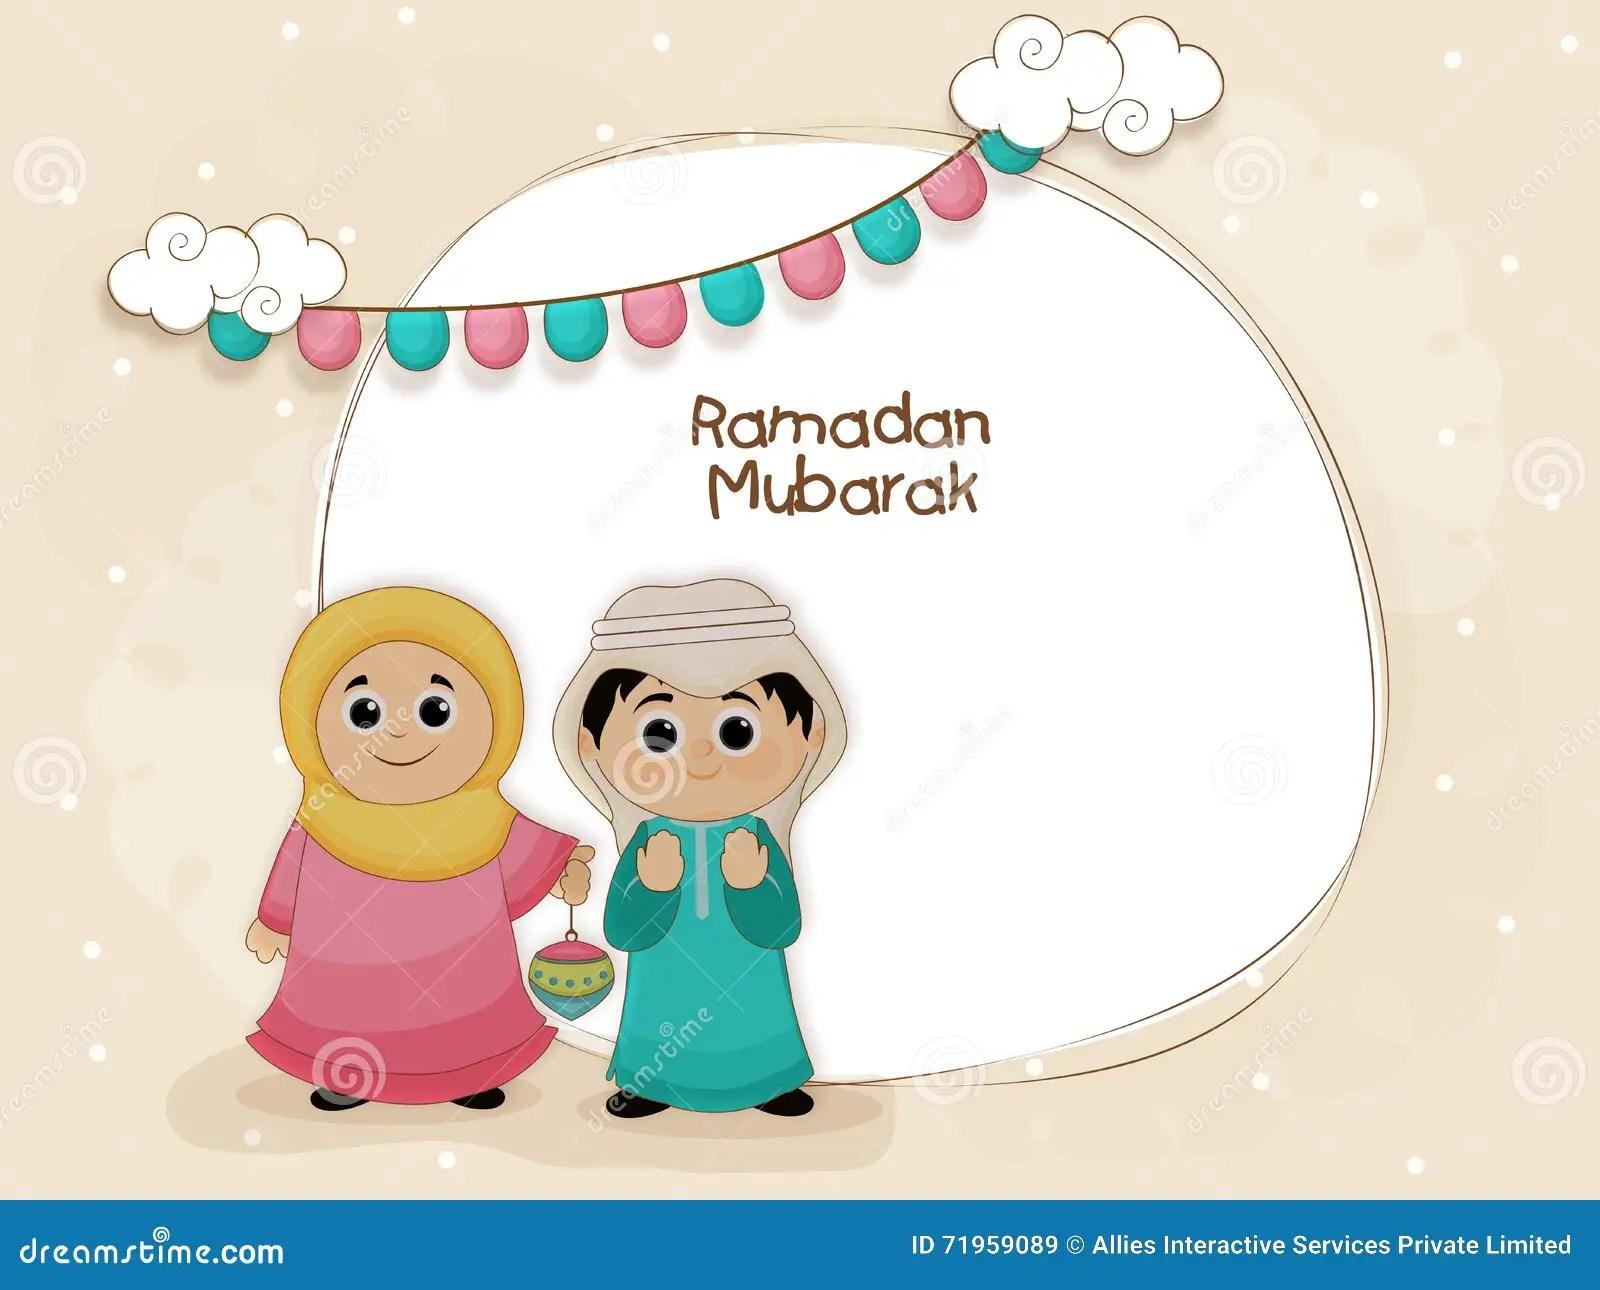 Islamic People For Ramadan Mubarak Stock Illustration